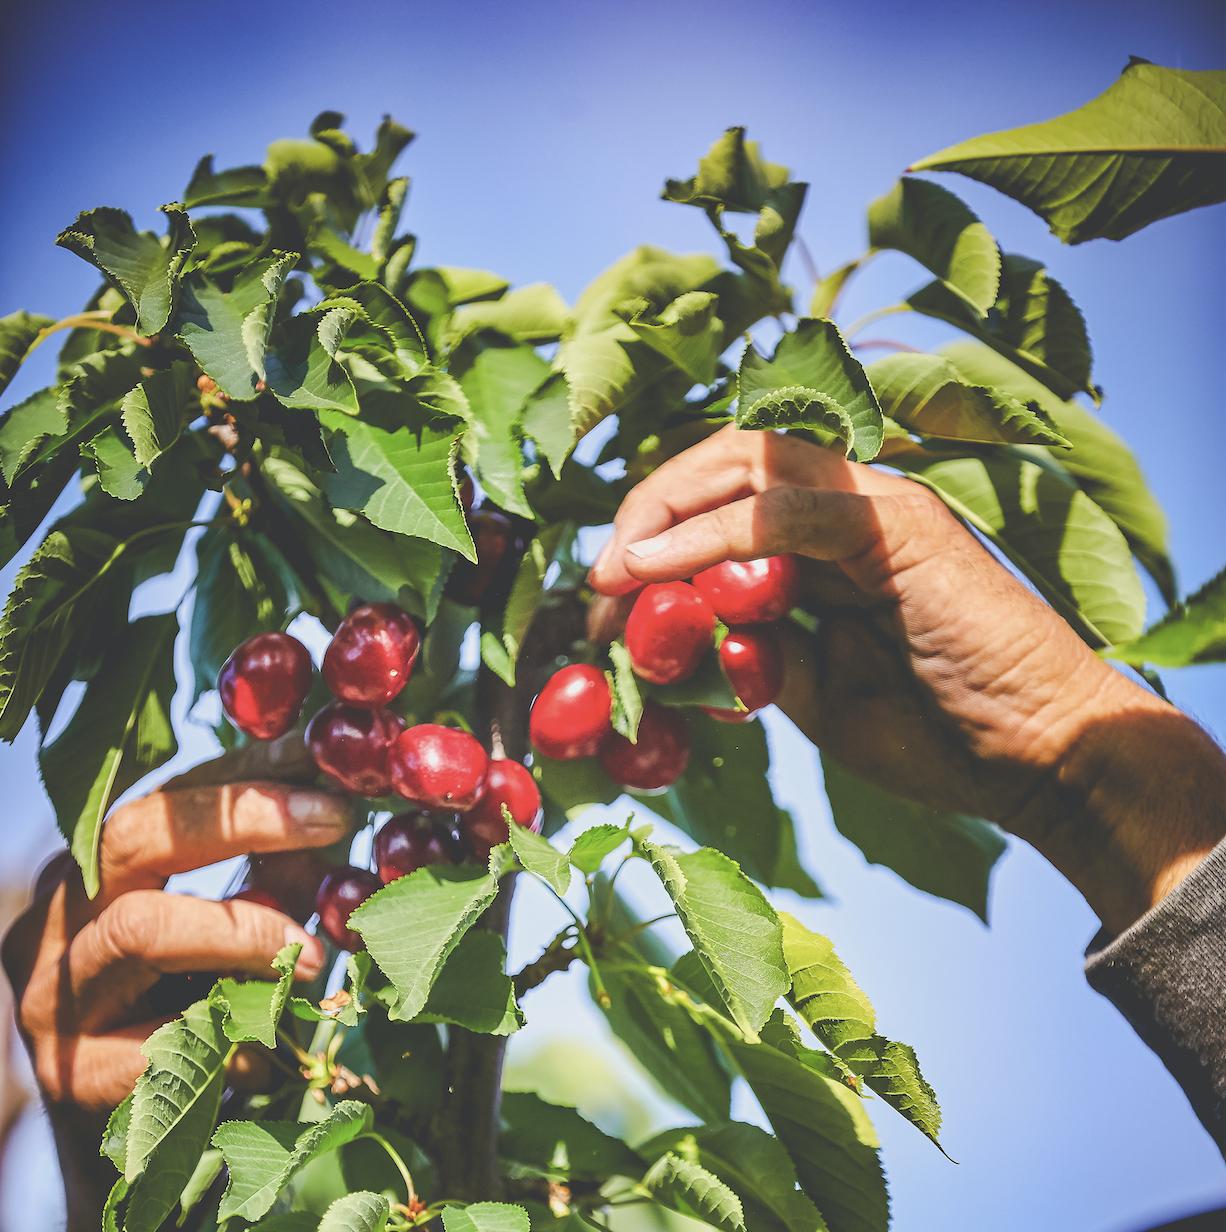 Harvest Time Cherry U-Pick